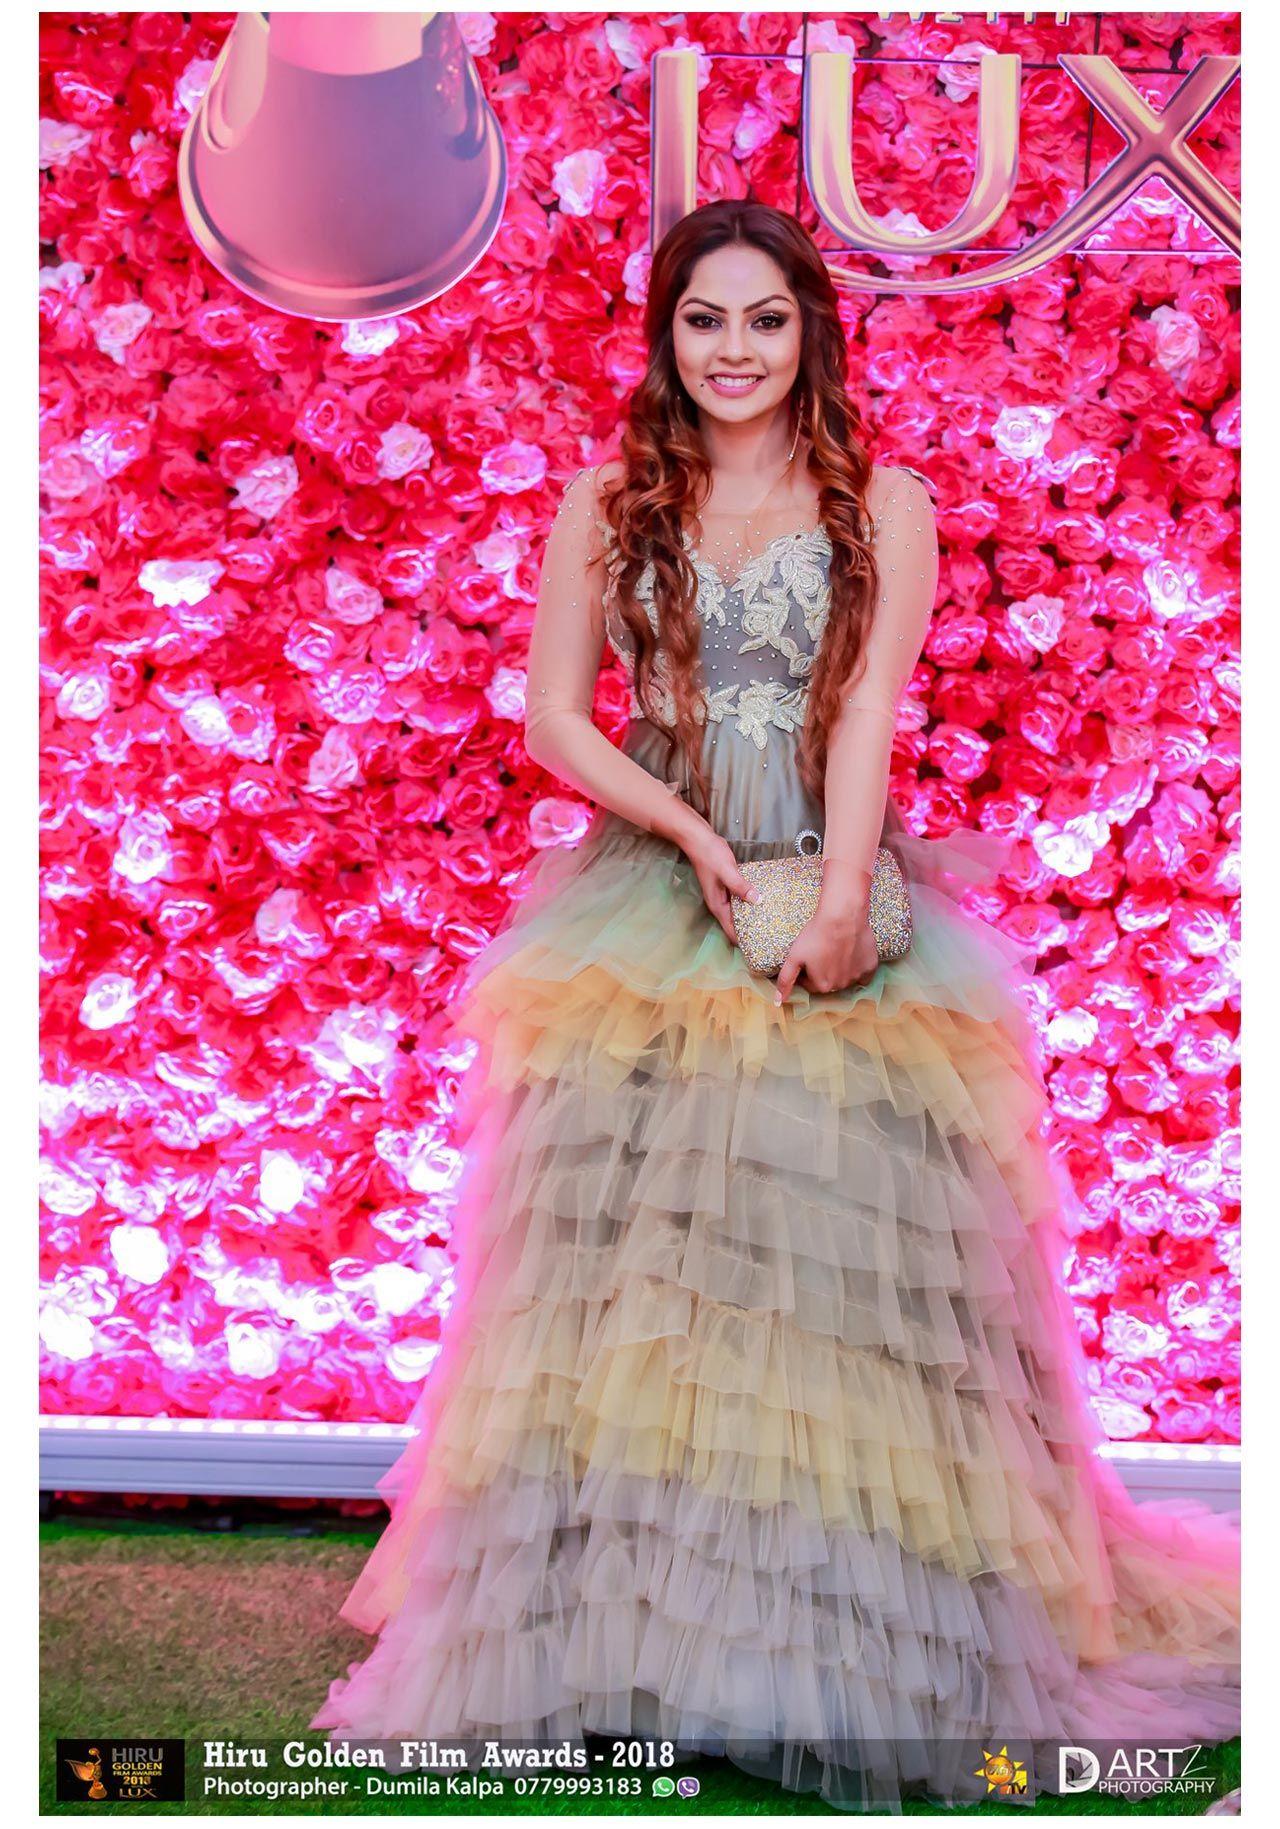 Shalani Tharaka Srilankan Models Sri Lankan Models Network Female Models Sri Lanka Latest Models Sri Lanka Male Formal Dresses Long Indian Girls Formal Dresses,Plus Size Wedding Dress Designers